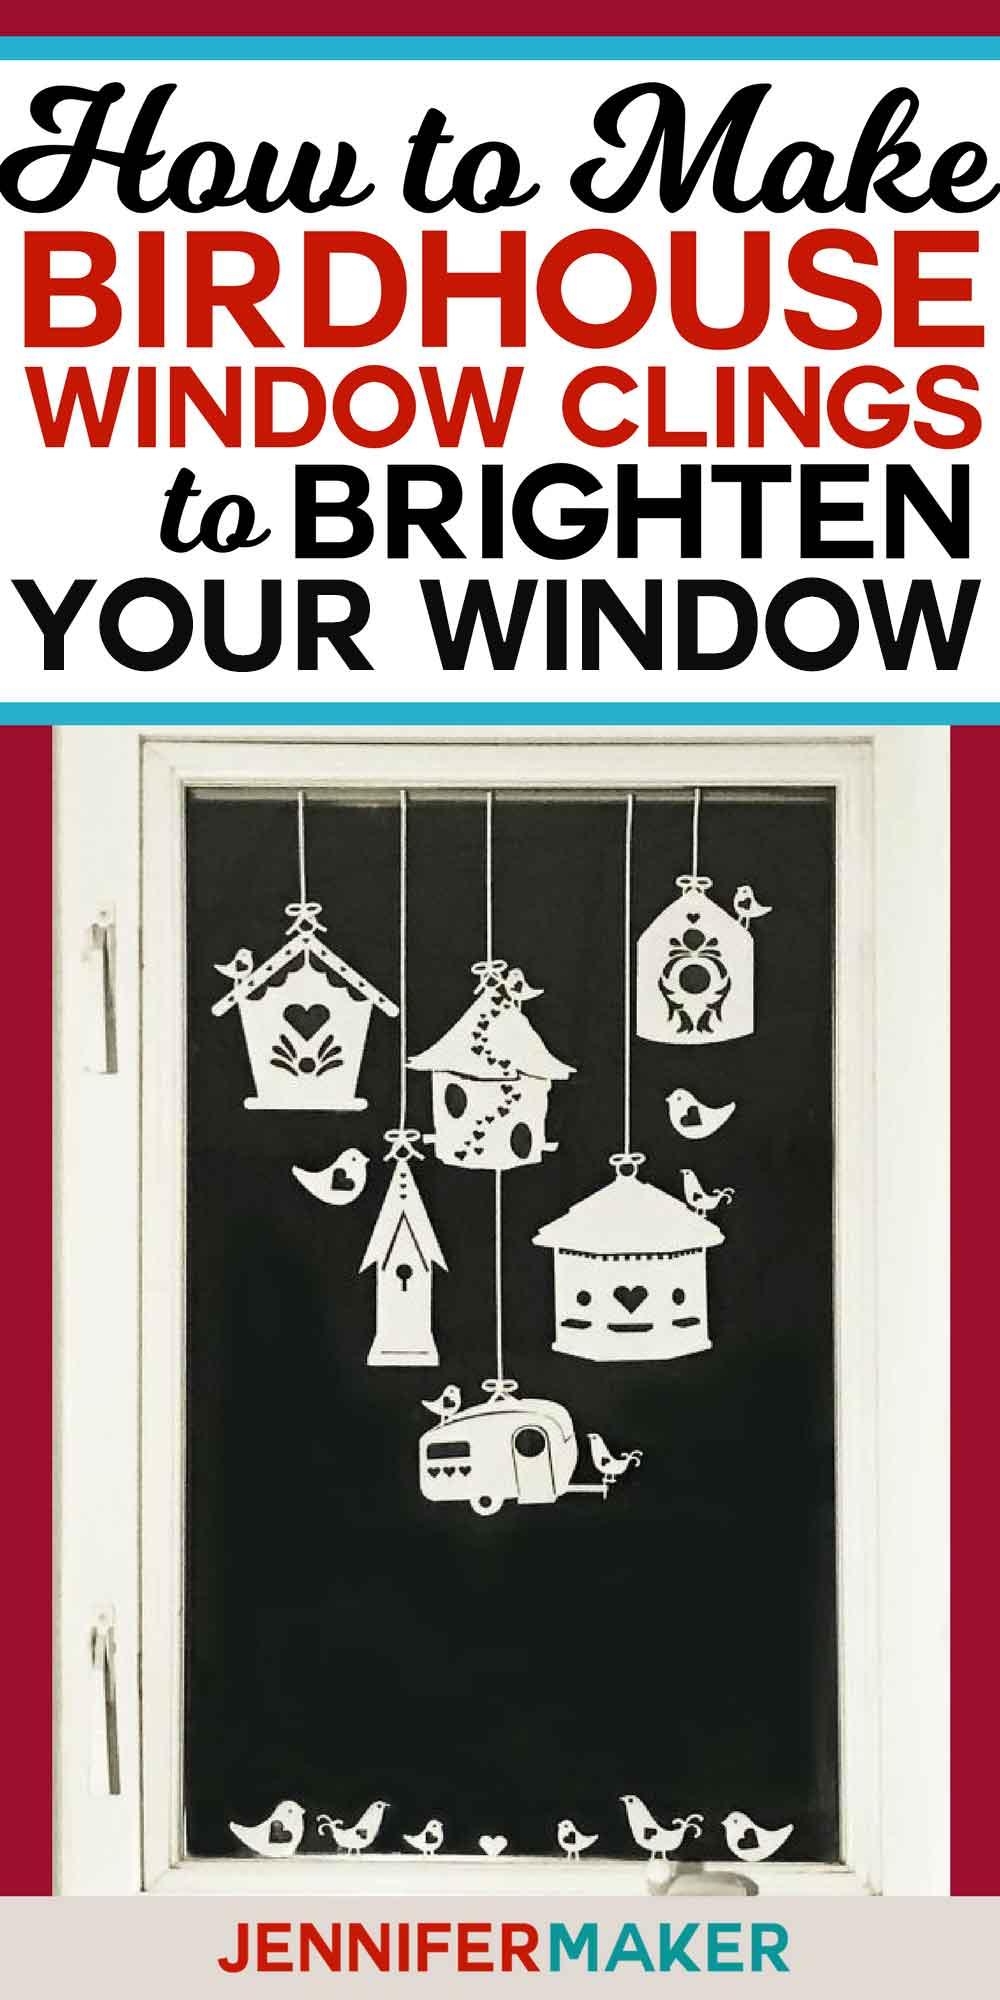 Birdhouse Window Clings | Free SVG Cut File for Cricut and Silhouette #birdhouses #cricut #windowideas